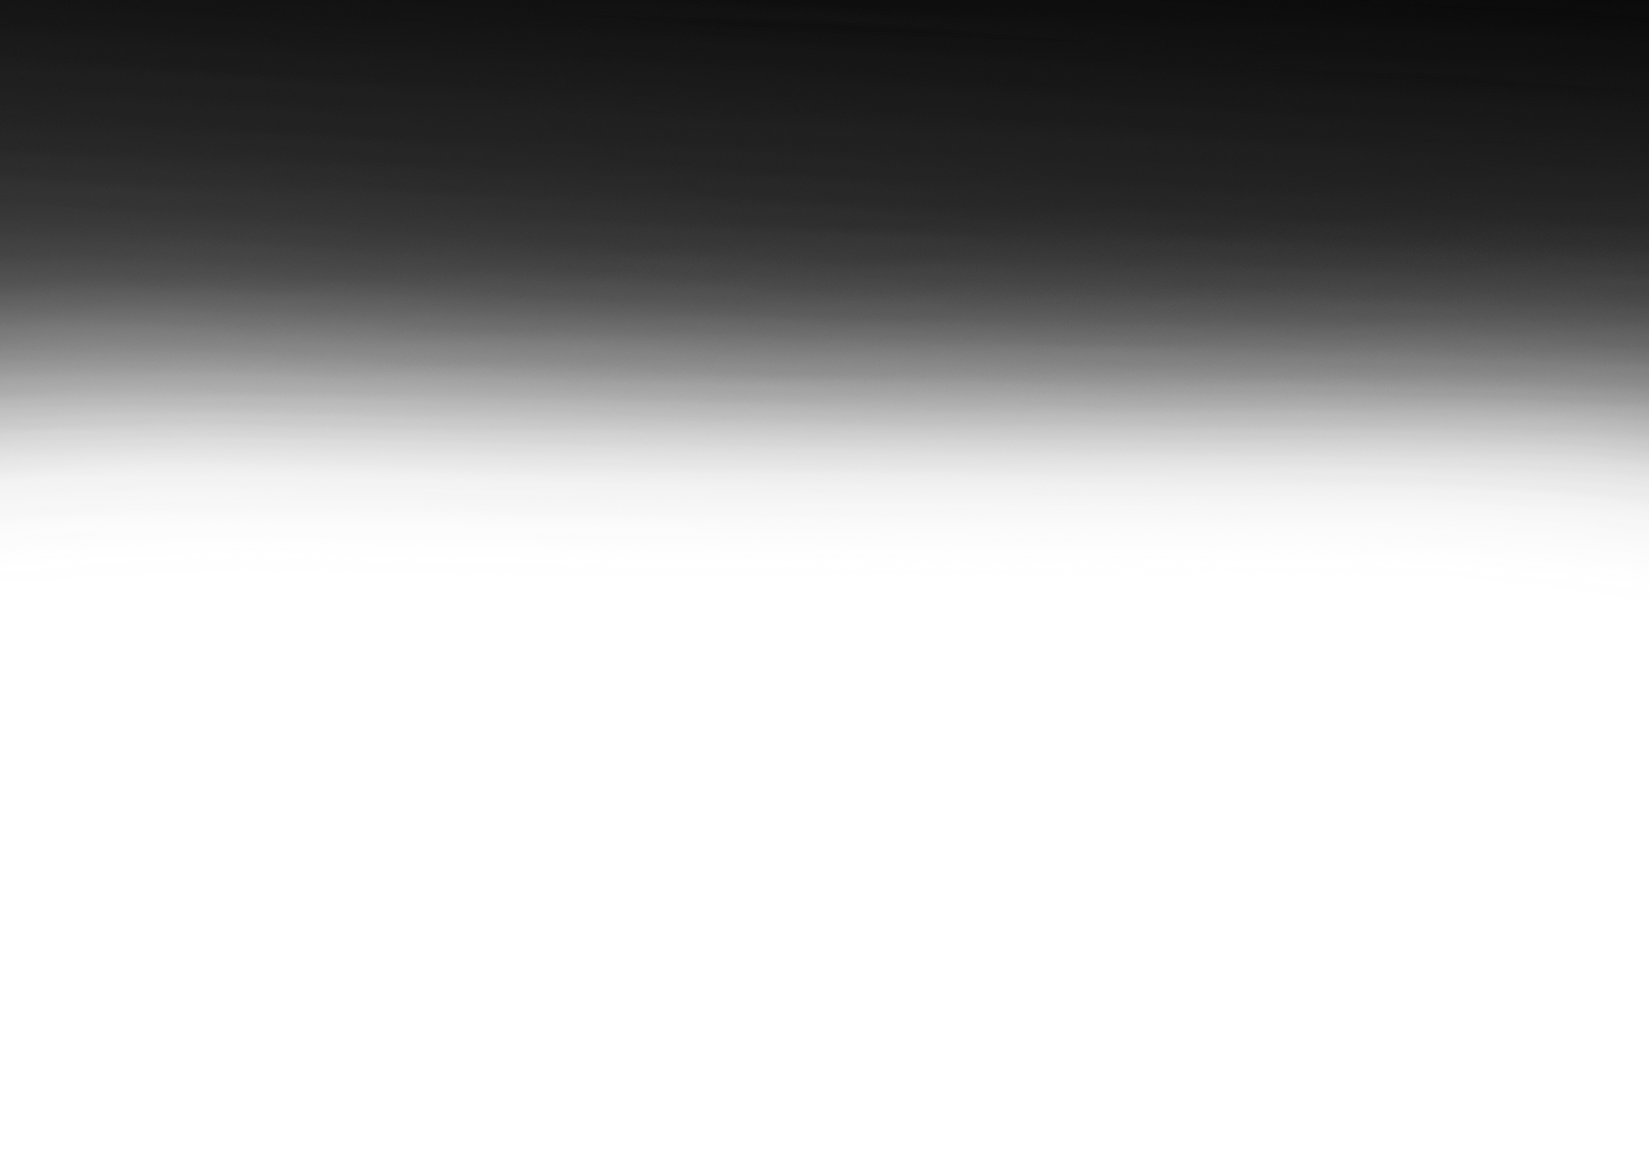 Faded BlackBackground - website.png